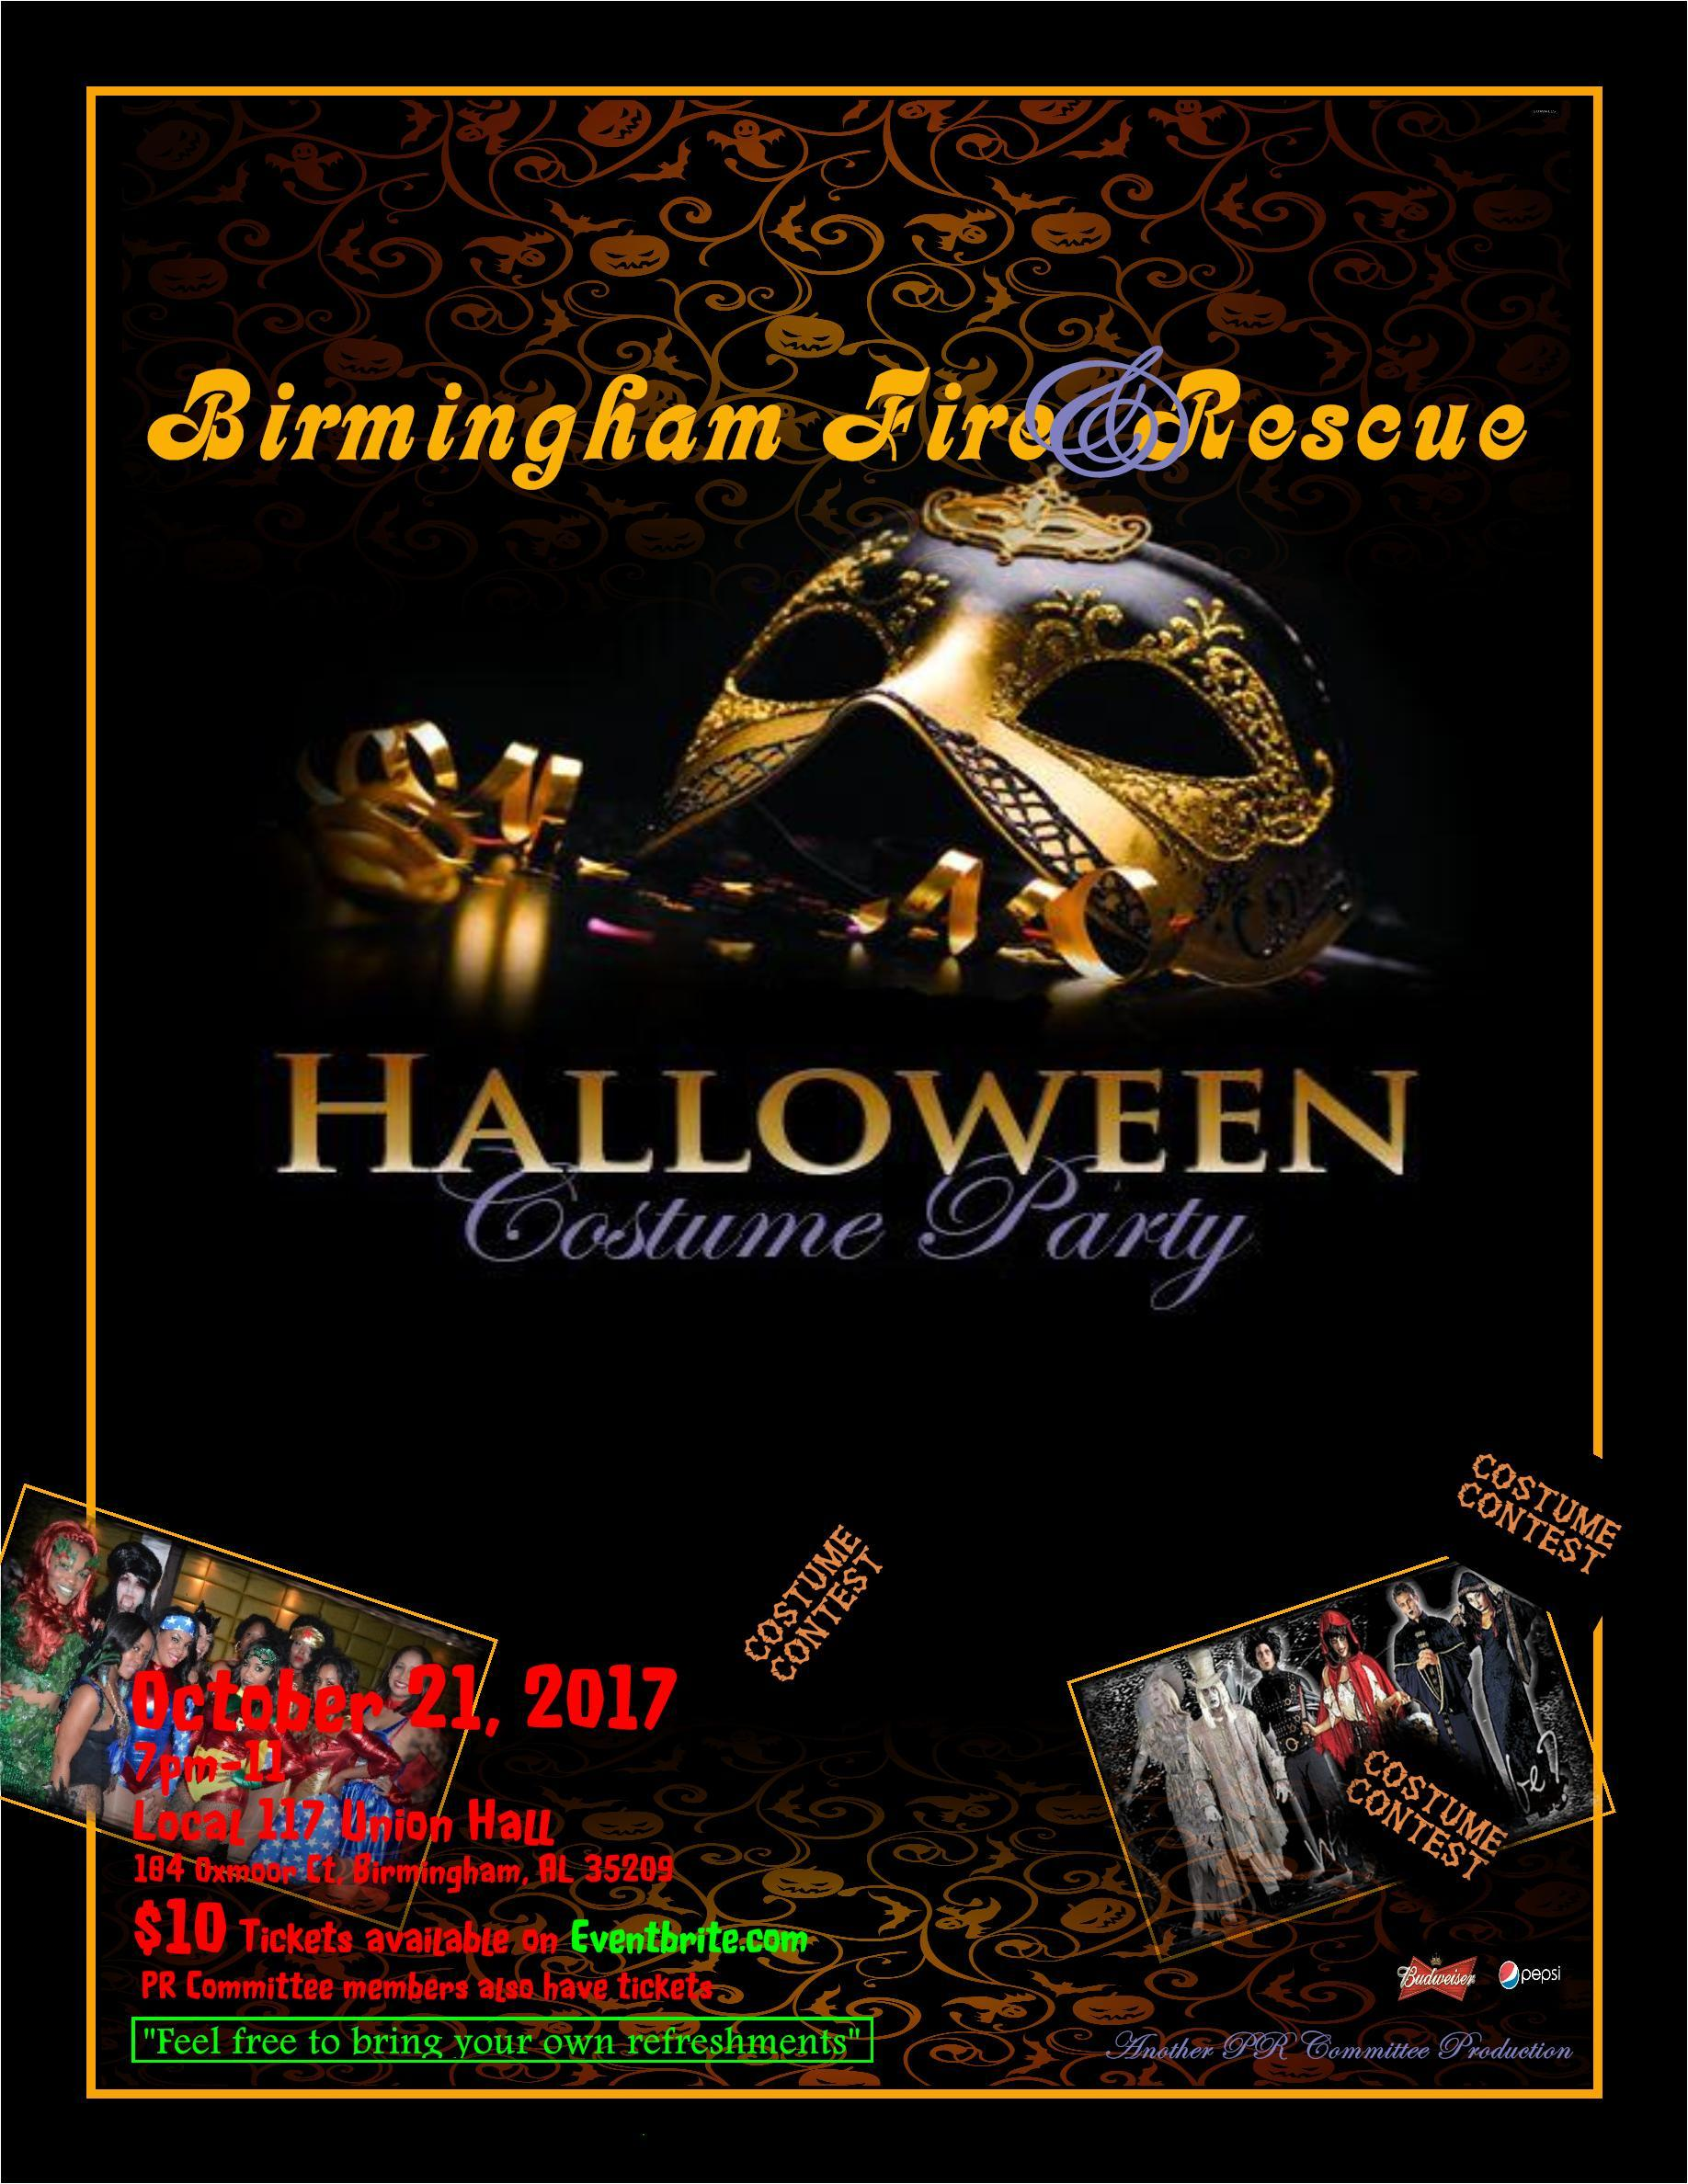 Public Show! @ The Dinner Detective - Birmingham, AL - 21 OCT 2017